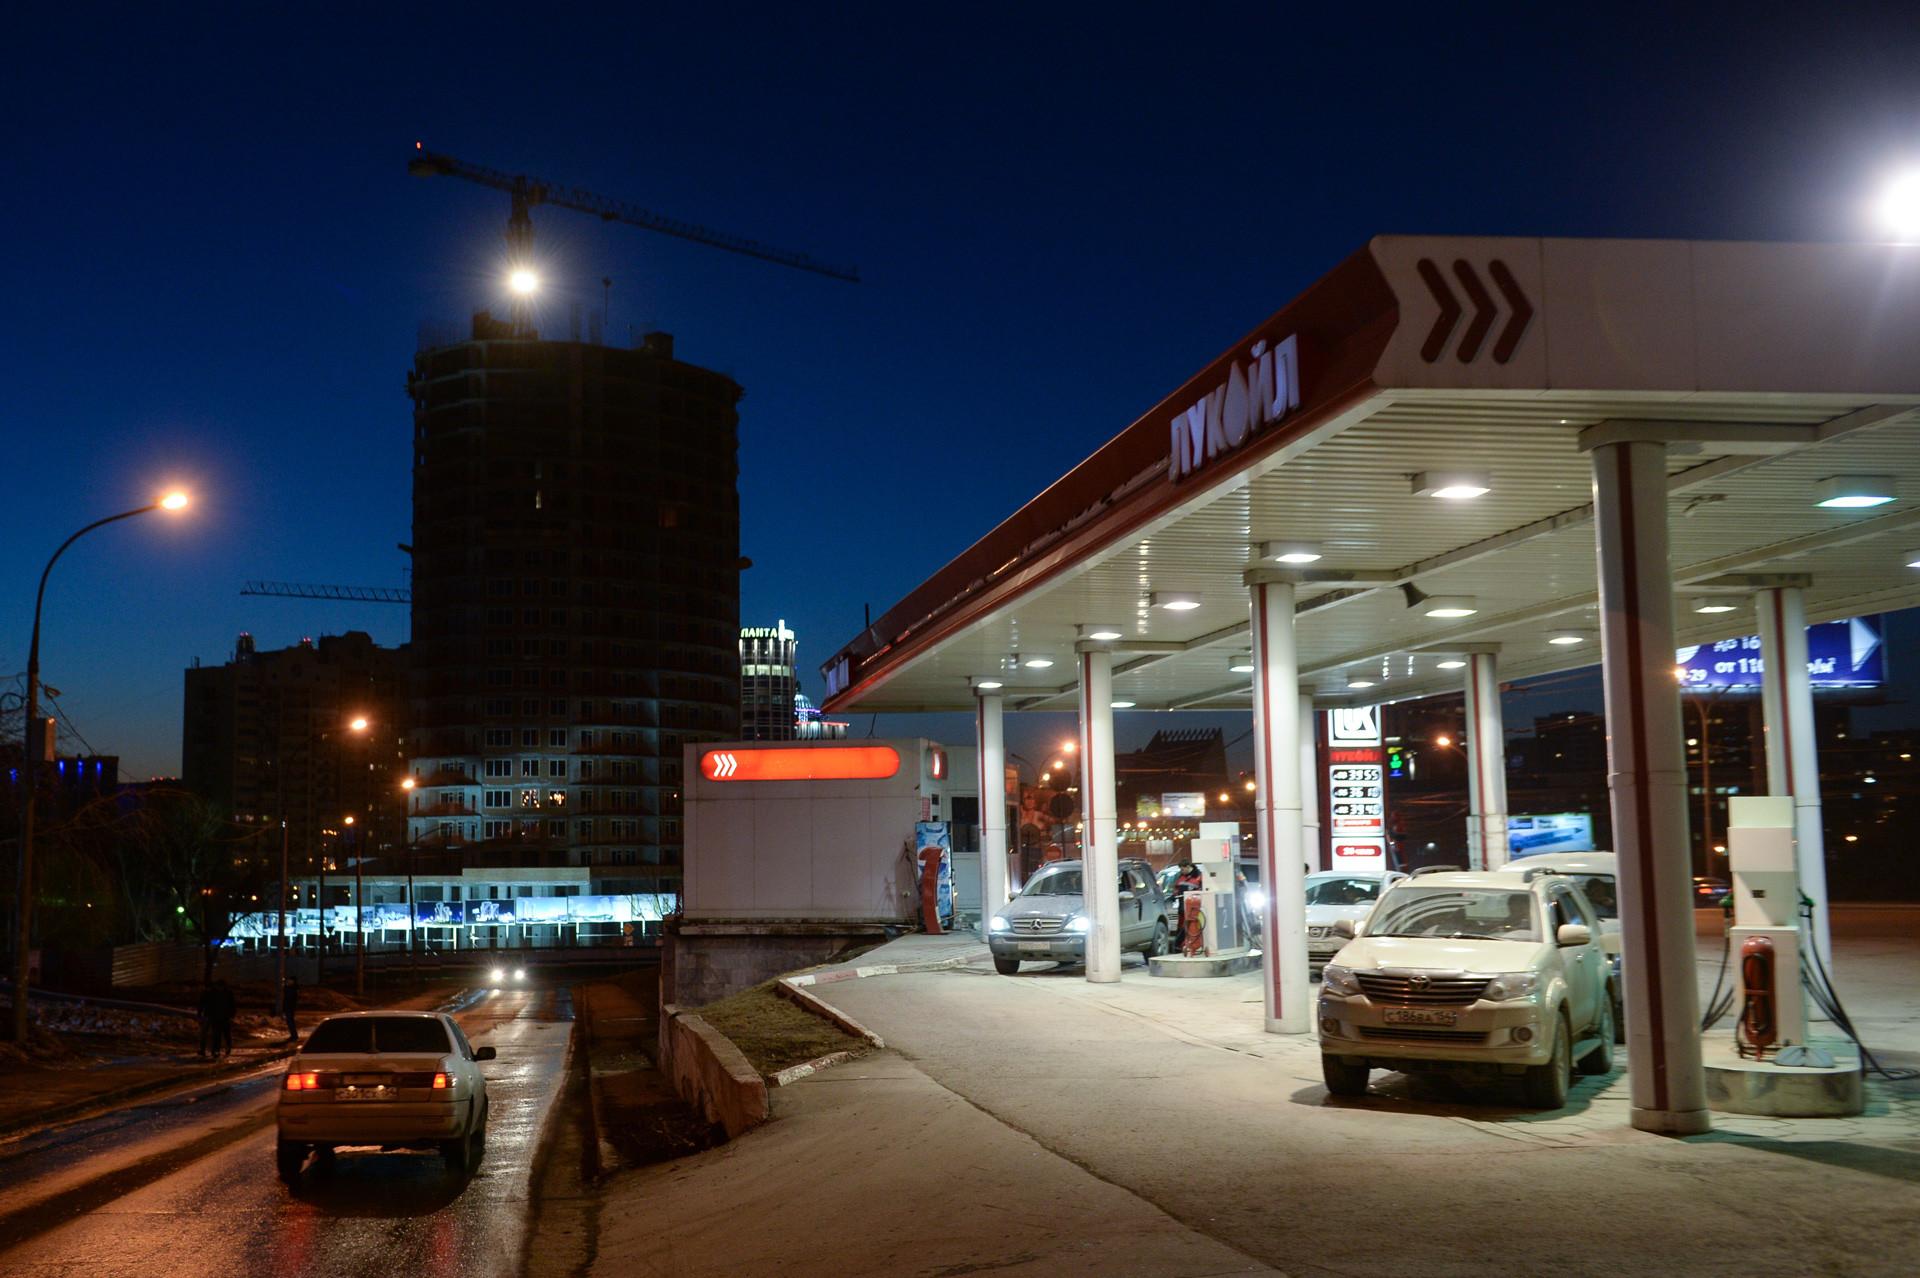 Фото: © РИА Новости / Александр Кряжев